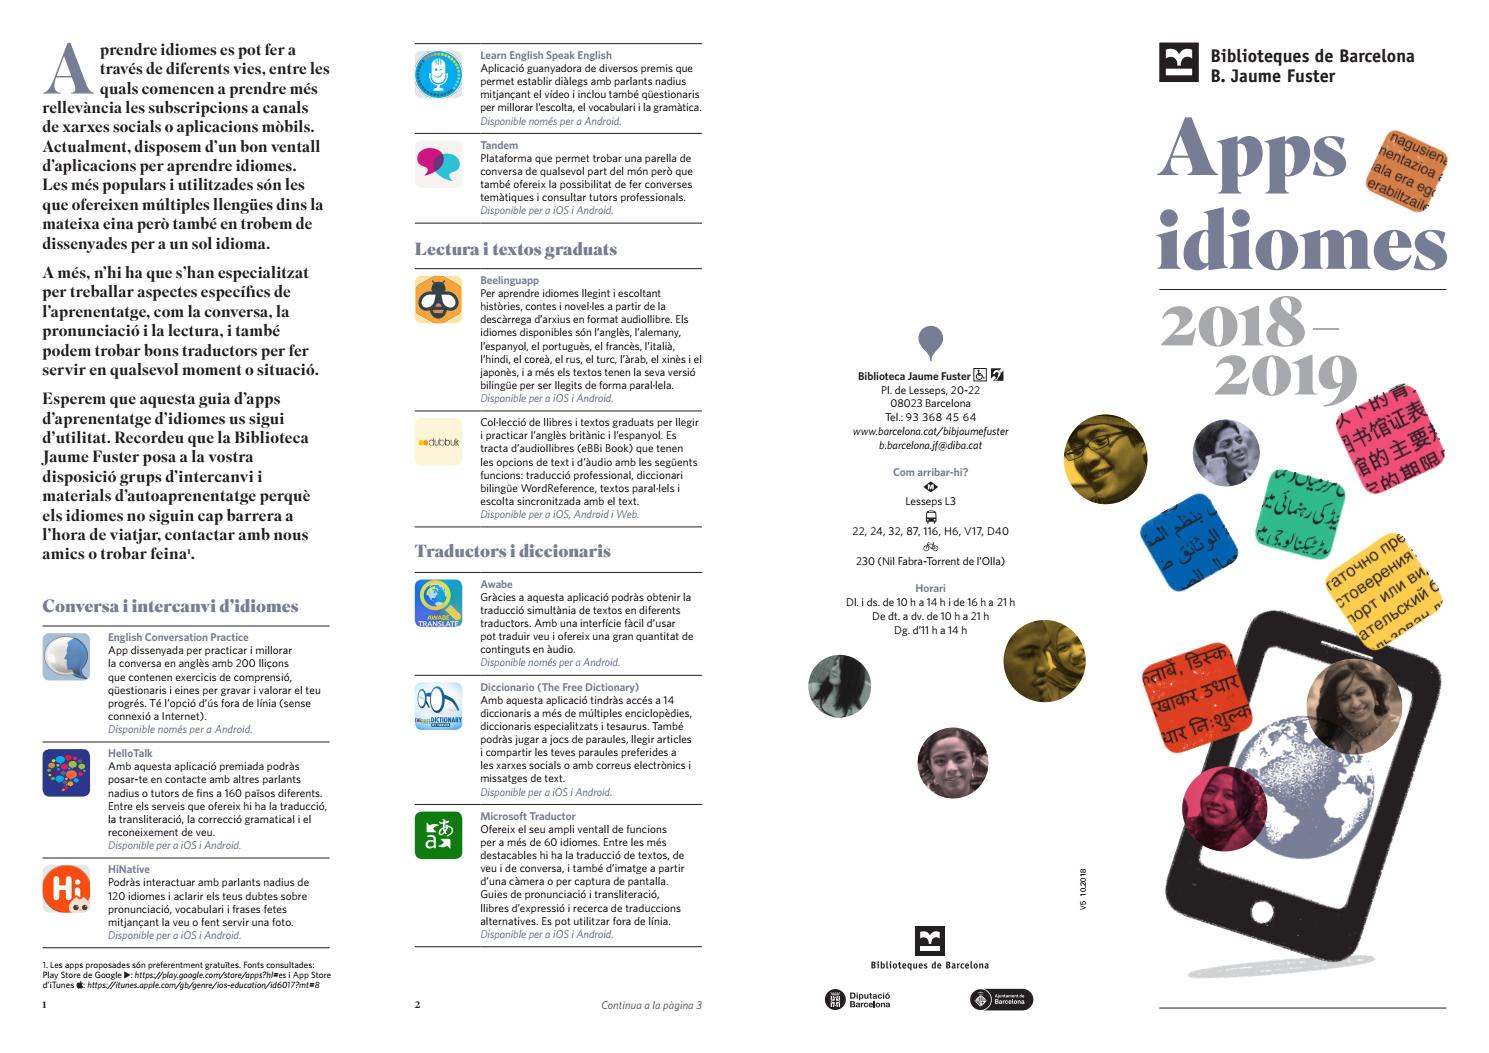 Guia Apps Idiomes 2018 2019 By Biblioteca Jaume Fuster Issuu